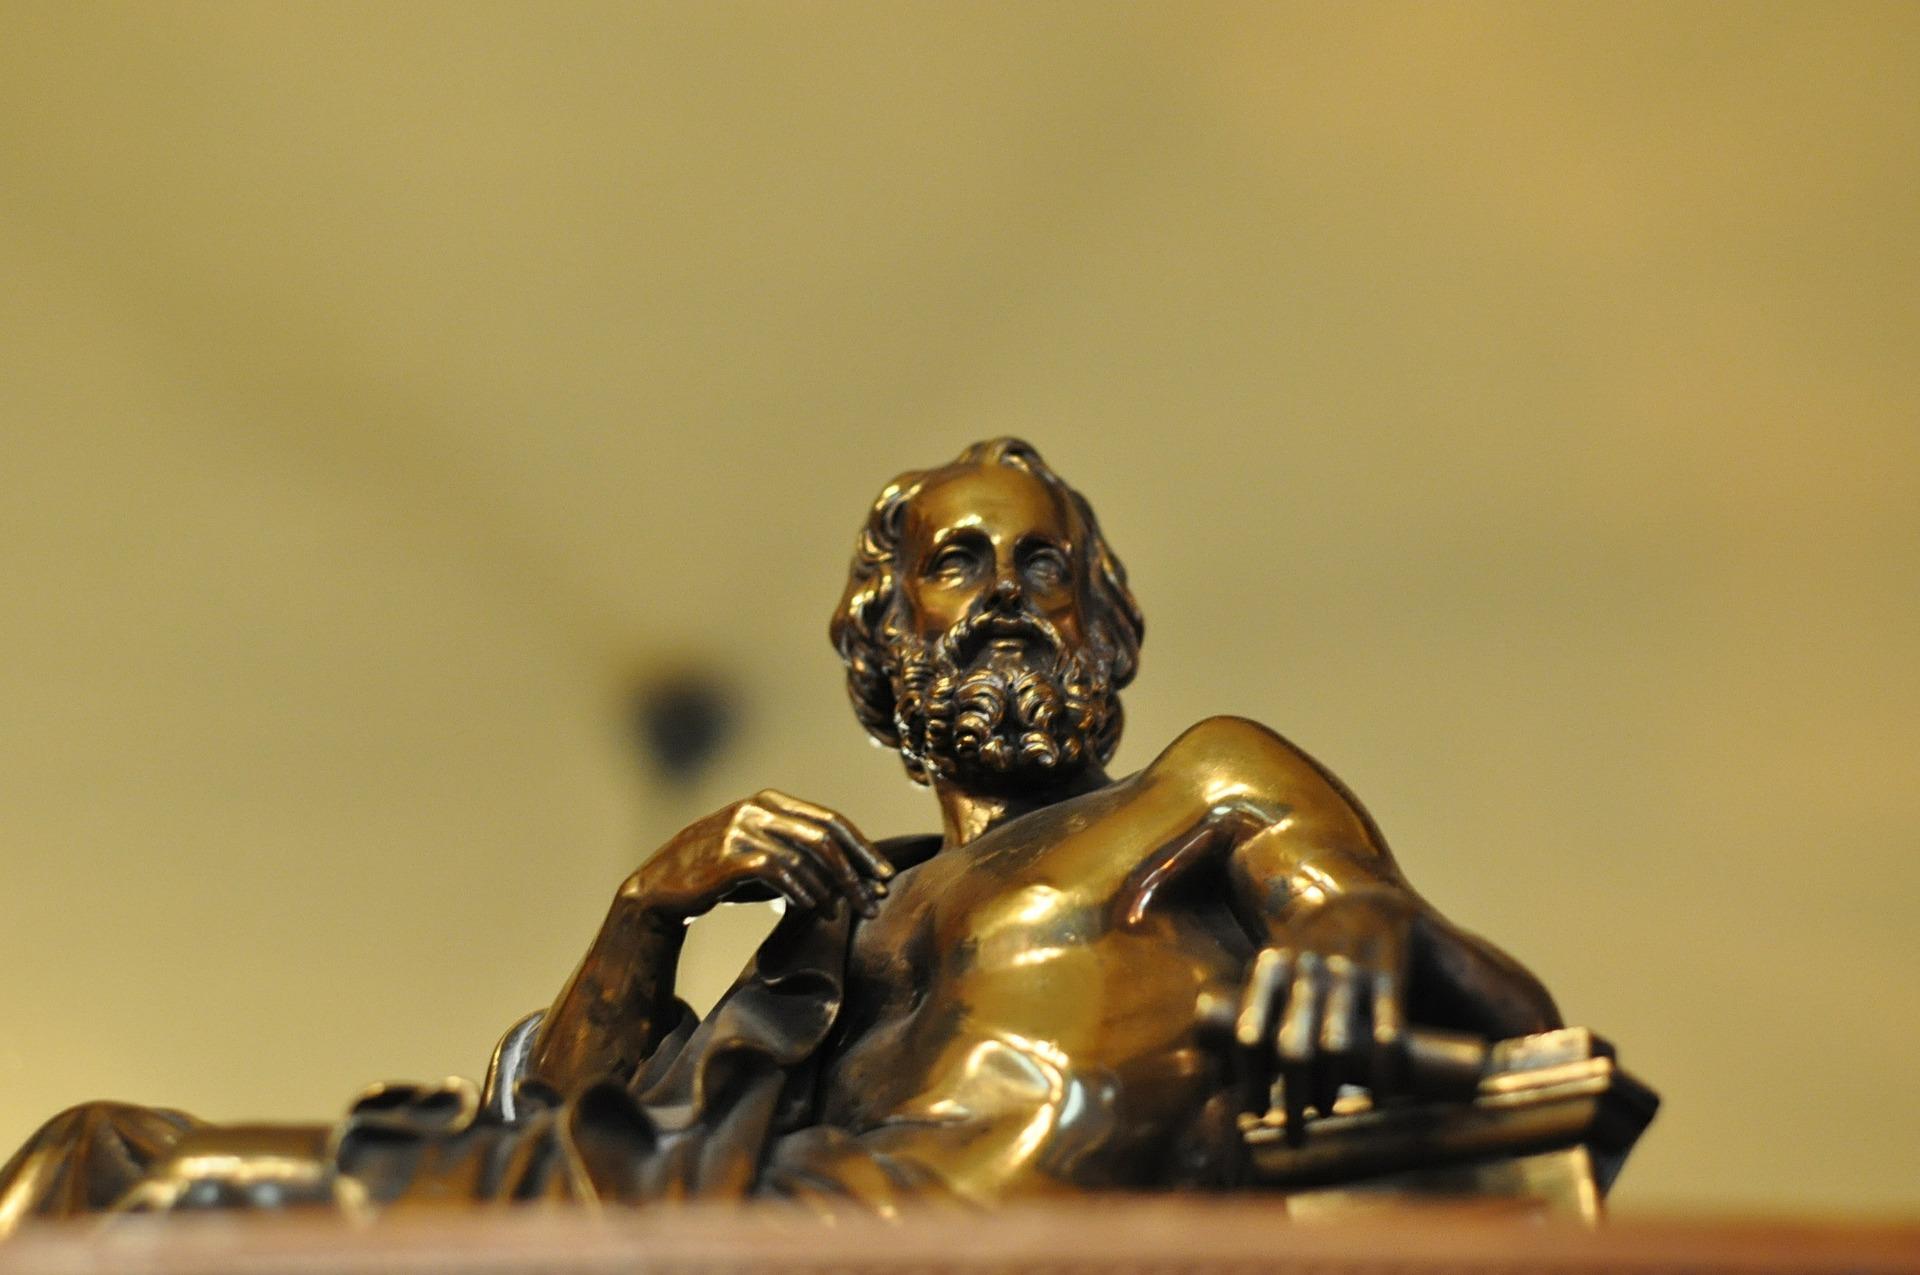 bronze-610837_1920